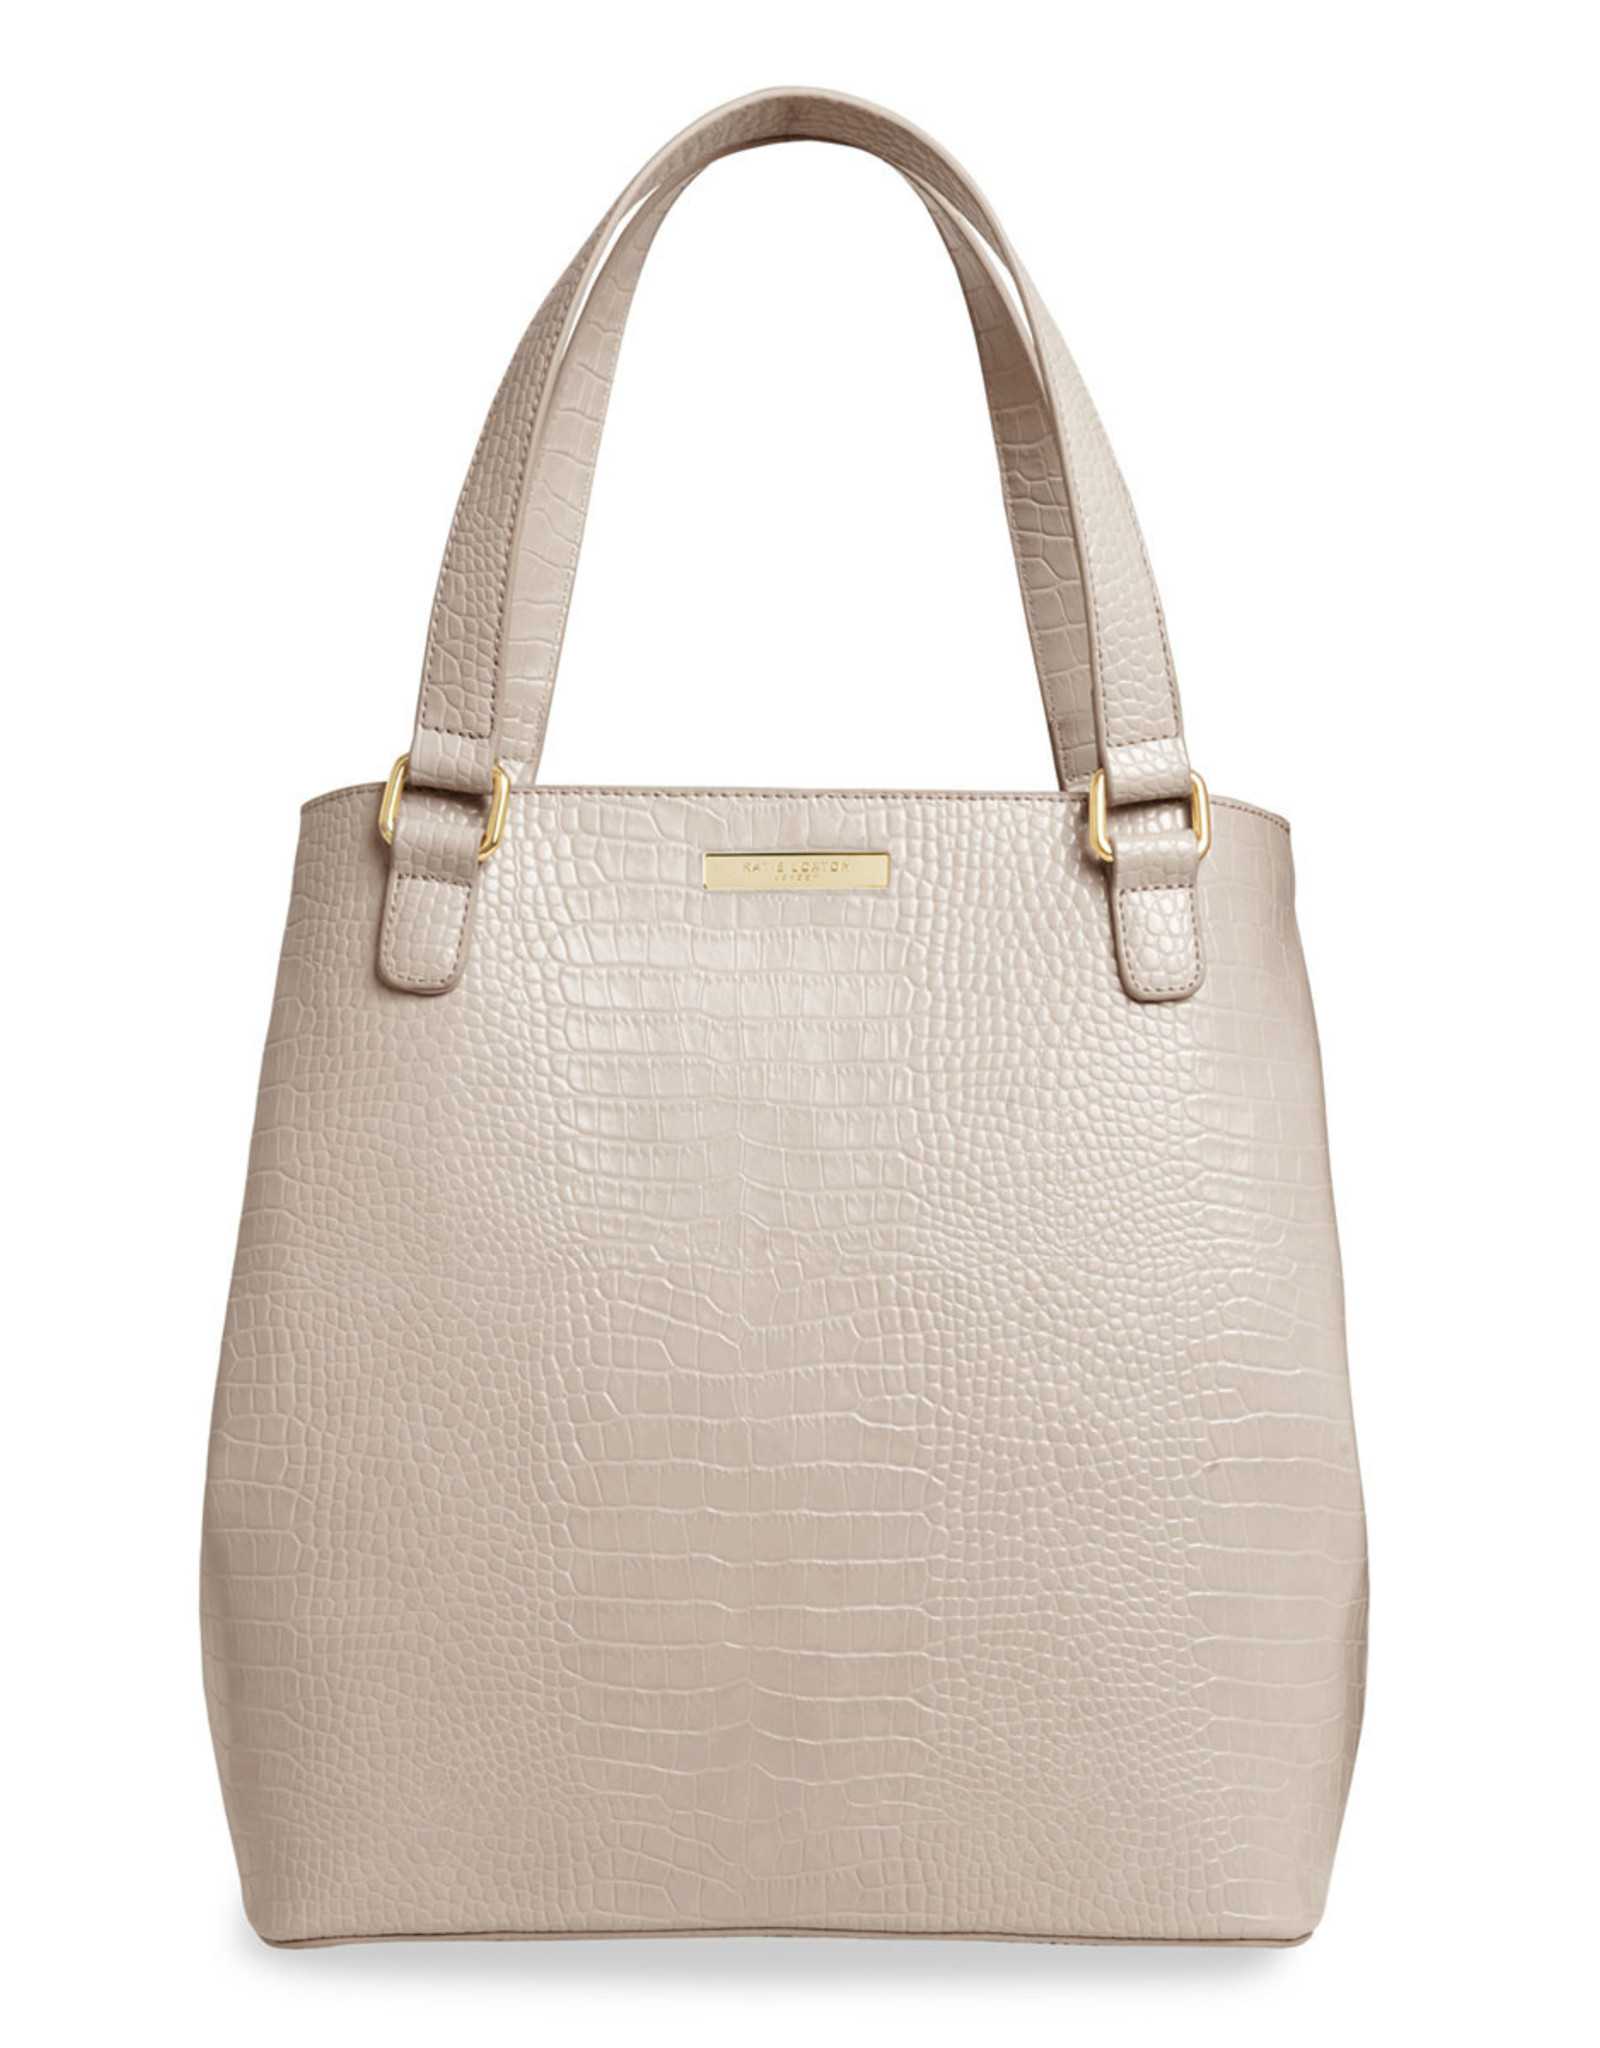 Katie Loxton Celine Croc Day Bag - Oyster